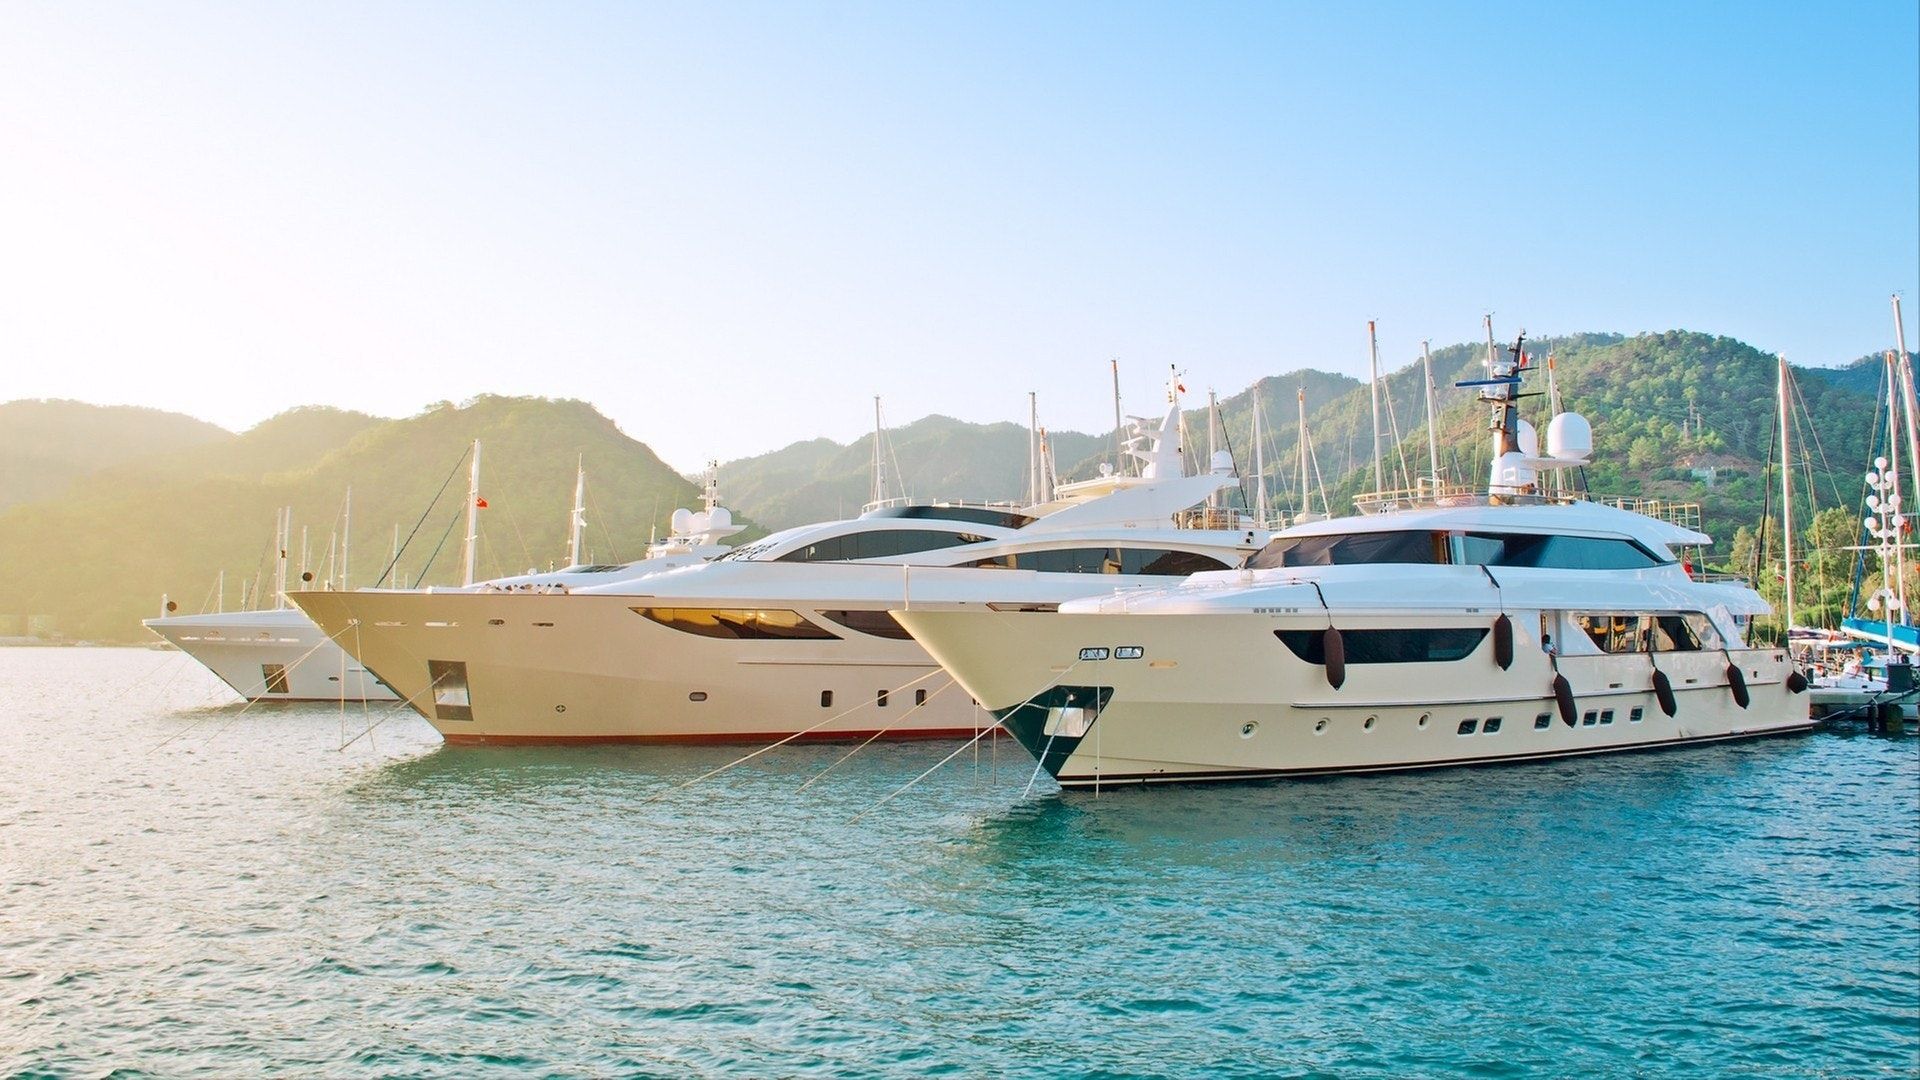 Superyachts moored in Bodrum, Turkey